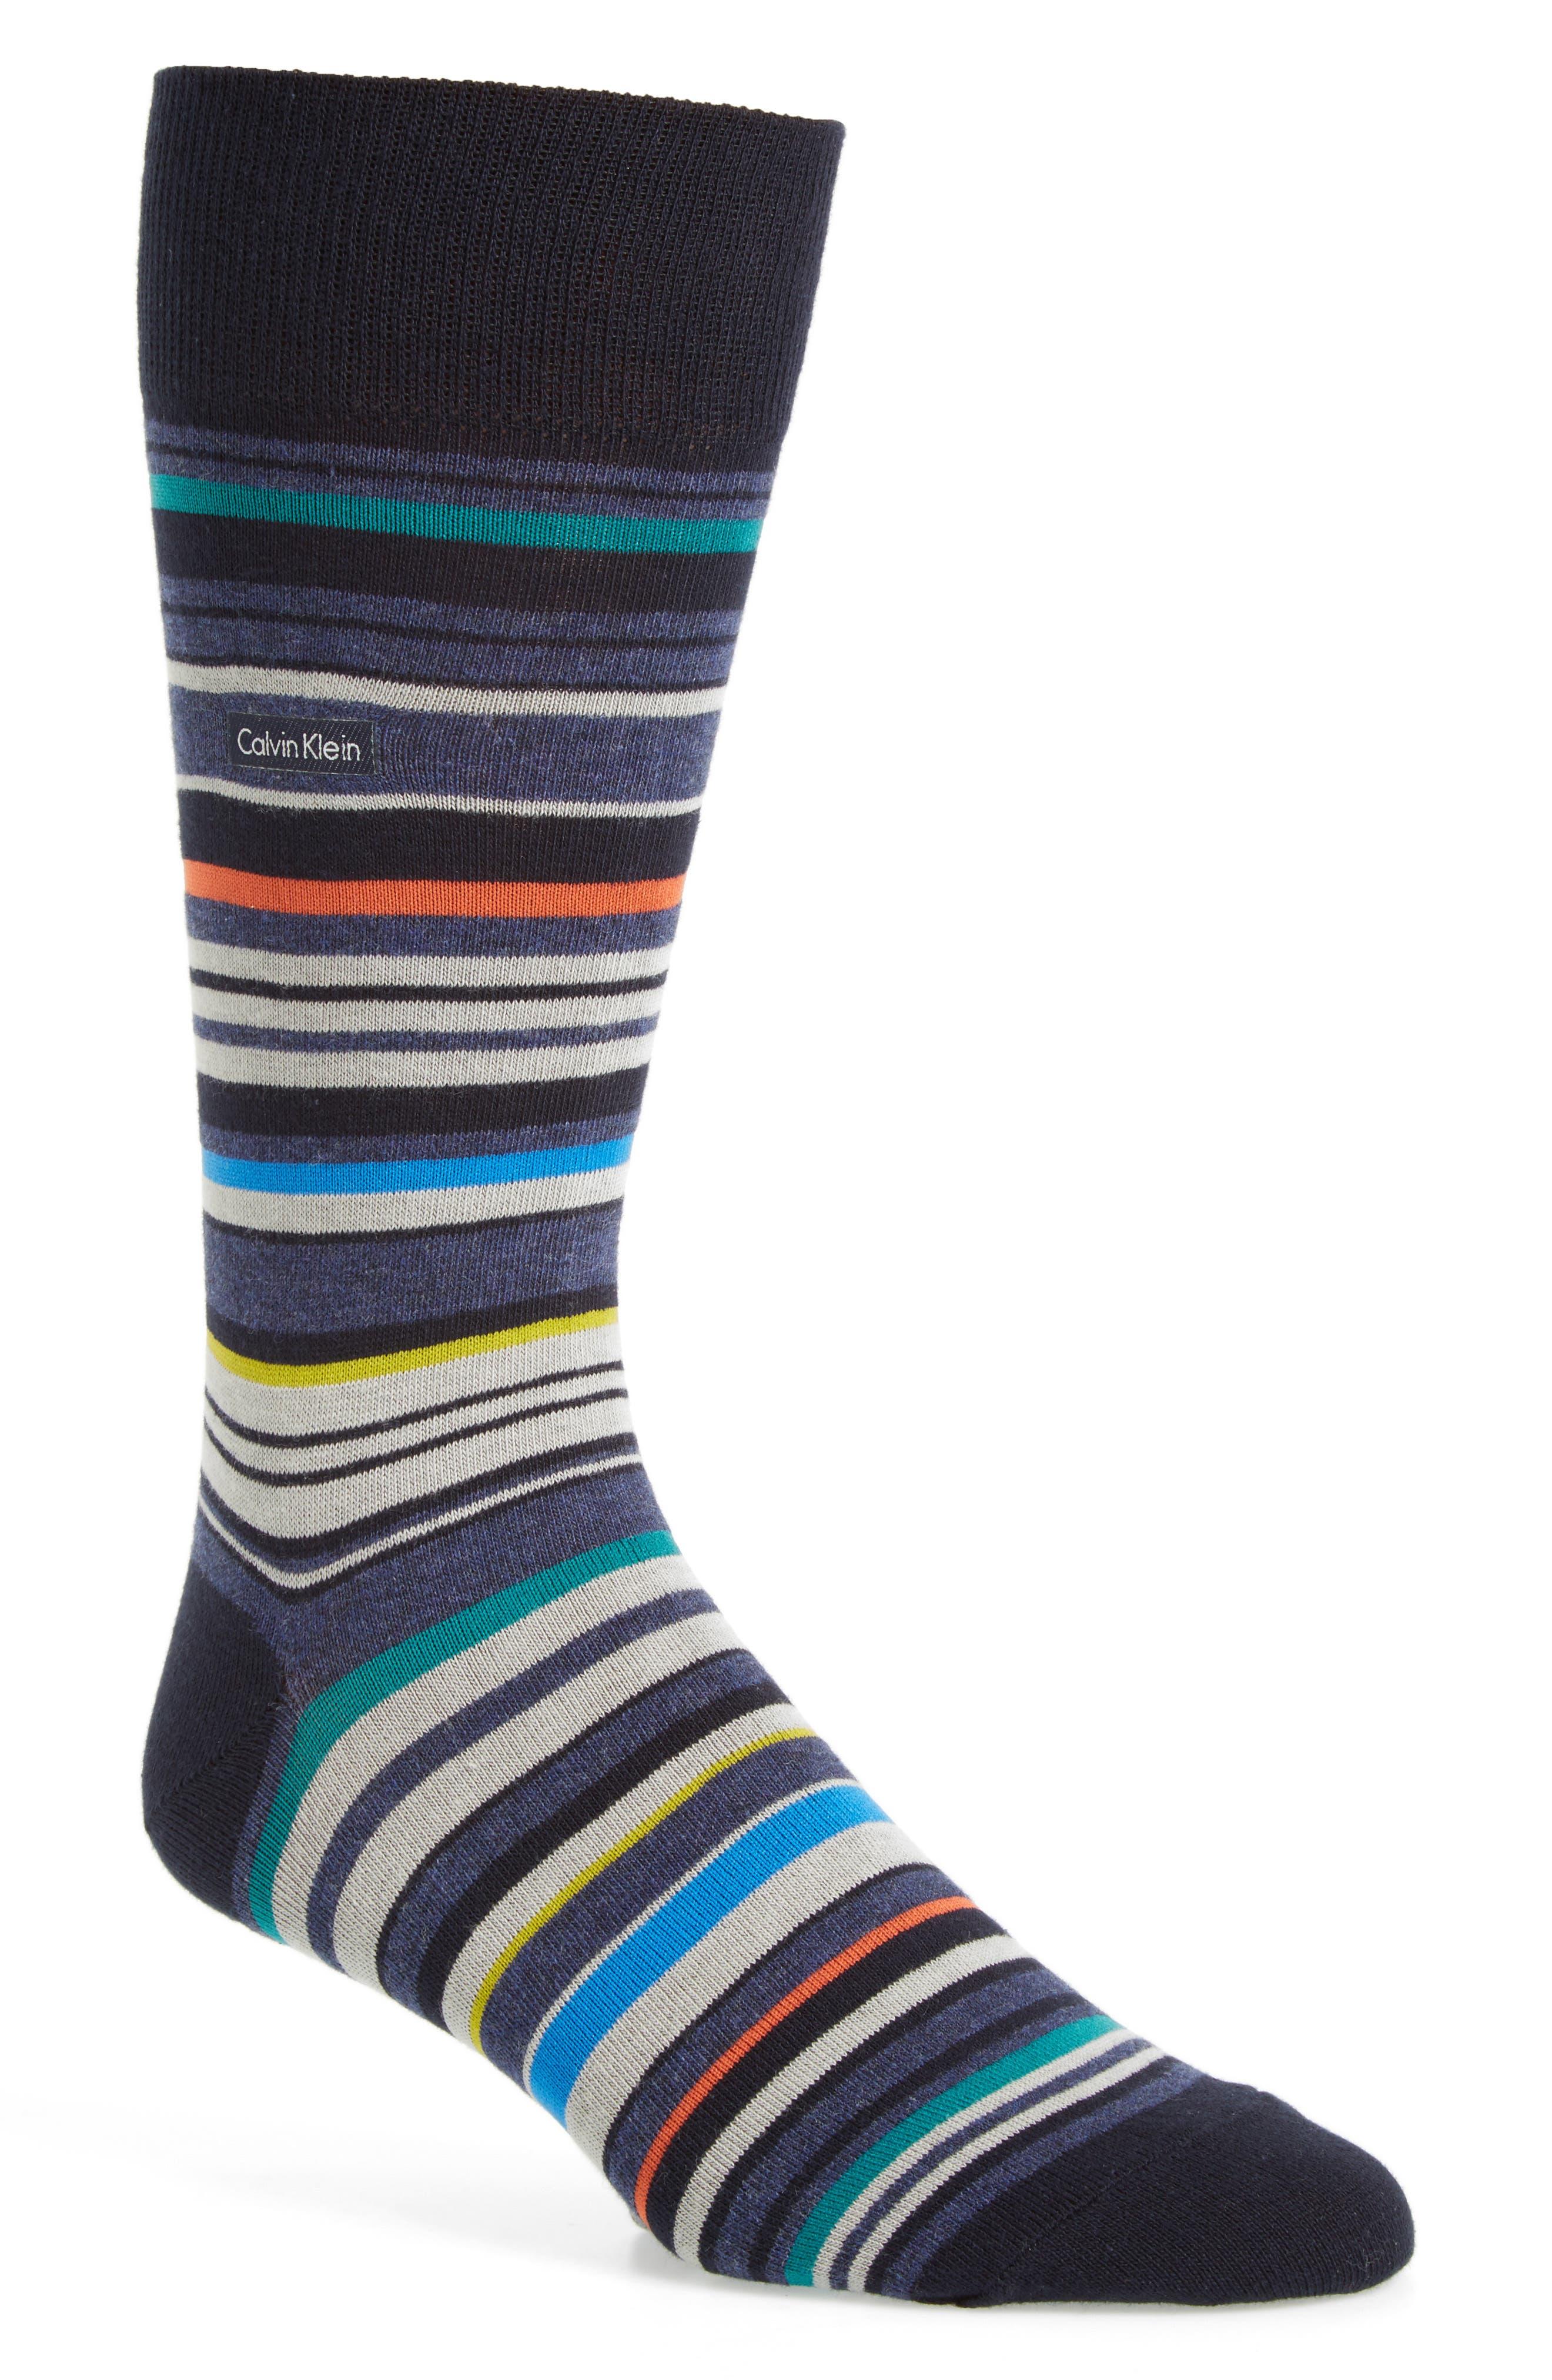 Main Image - Calvin Klein Multistripe Emblem Socks